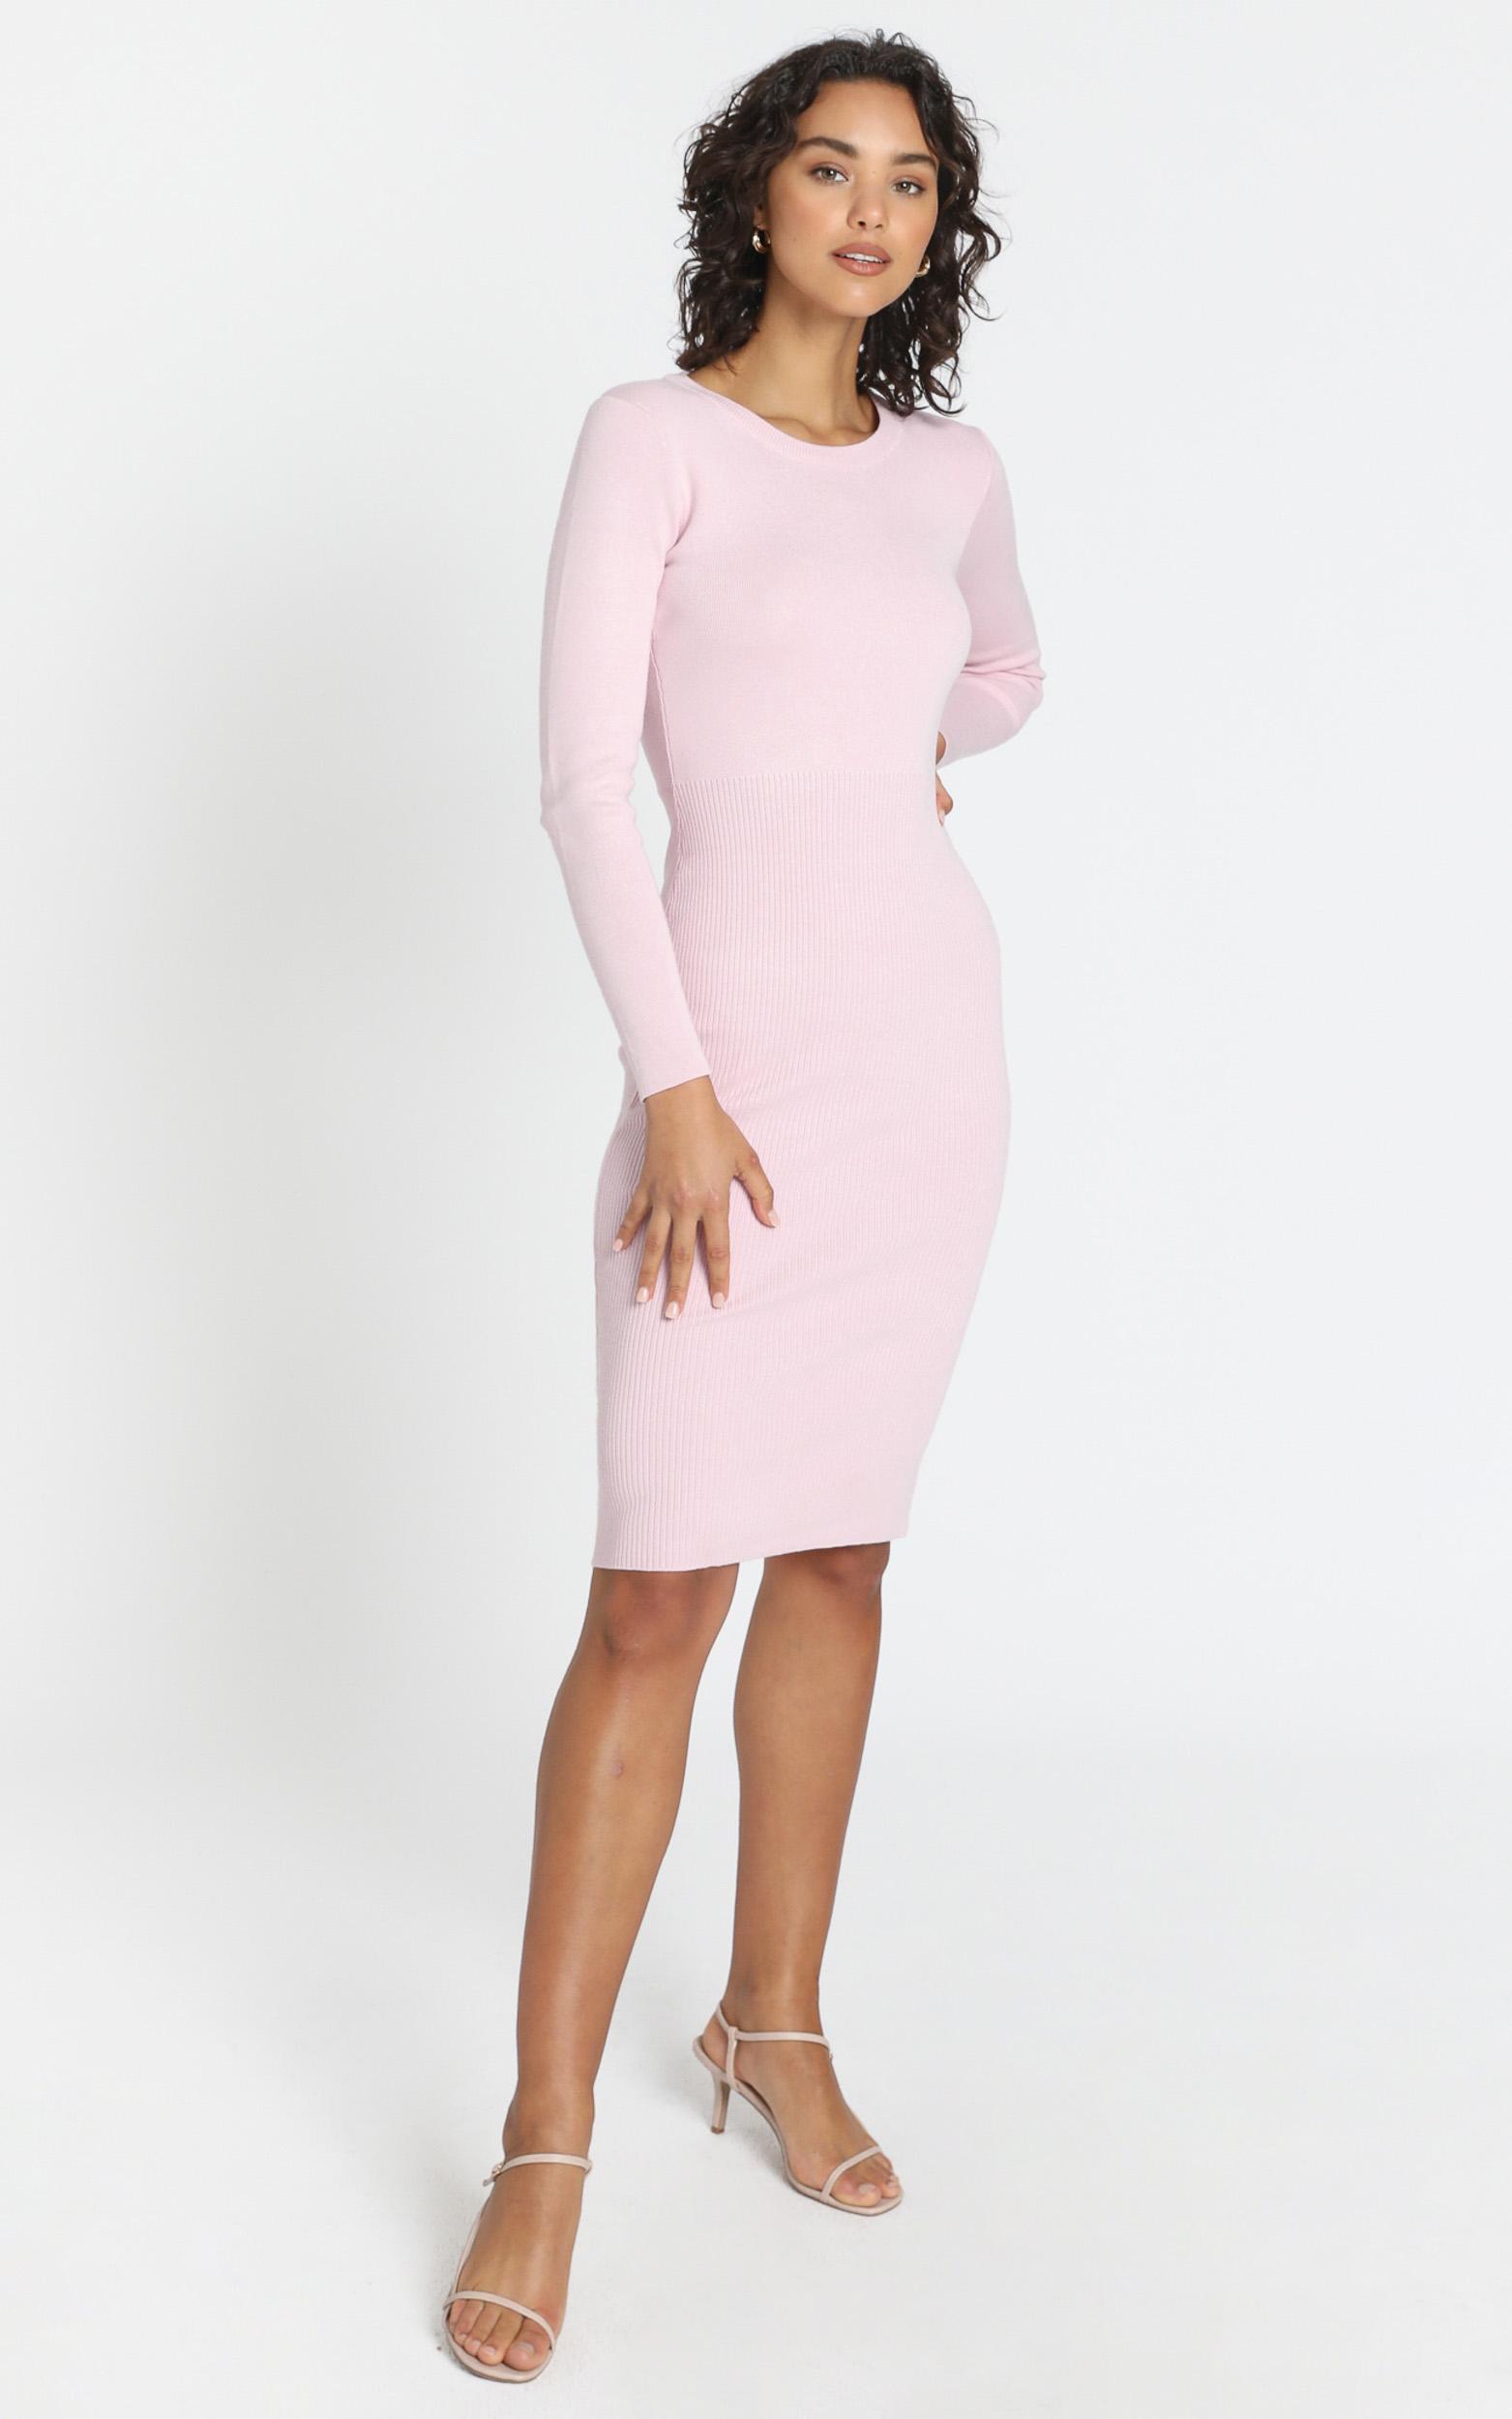 Irina Dress in Baby Pink - XS/S, PNK1, hi-res image number null